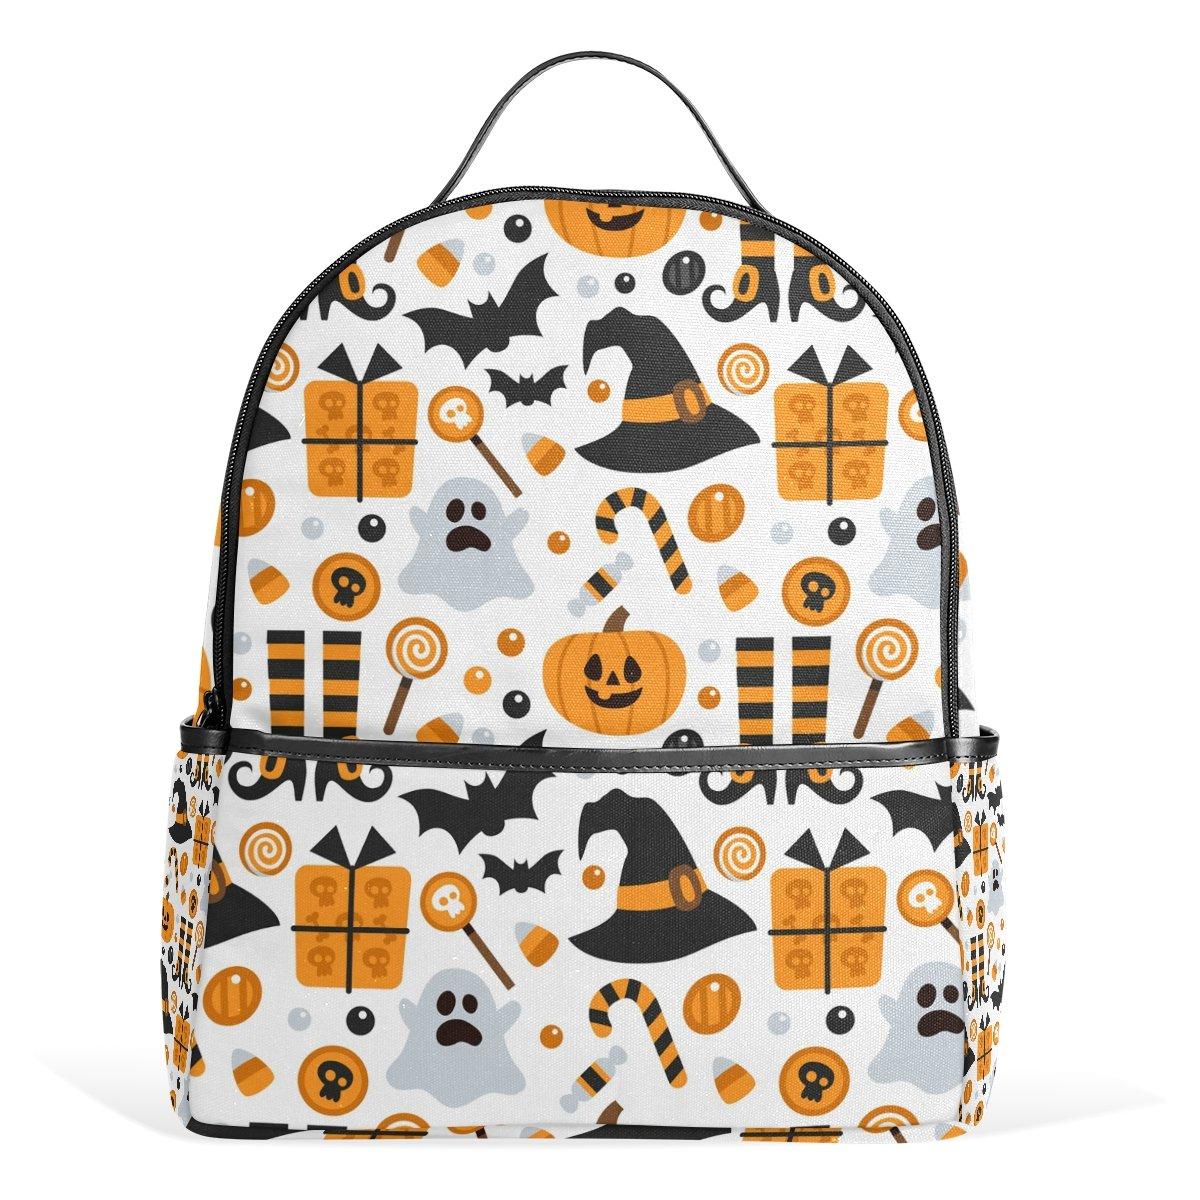 JSTEL Halloween Pumpkin Ghost Bat Candy School Backpack 4th 5th 6th Grade  for Boys Teen Girls Kids  Amazon.co.uk  Clothing f7361736f23b8